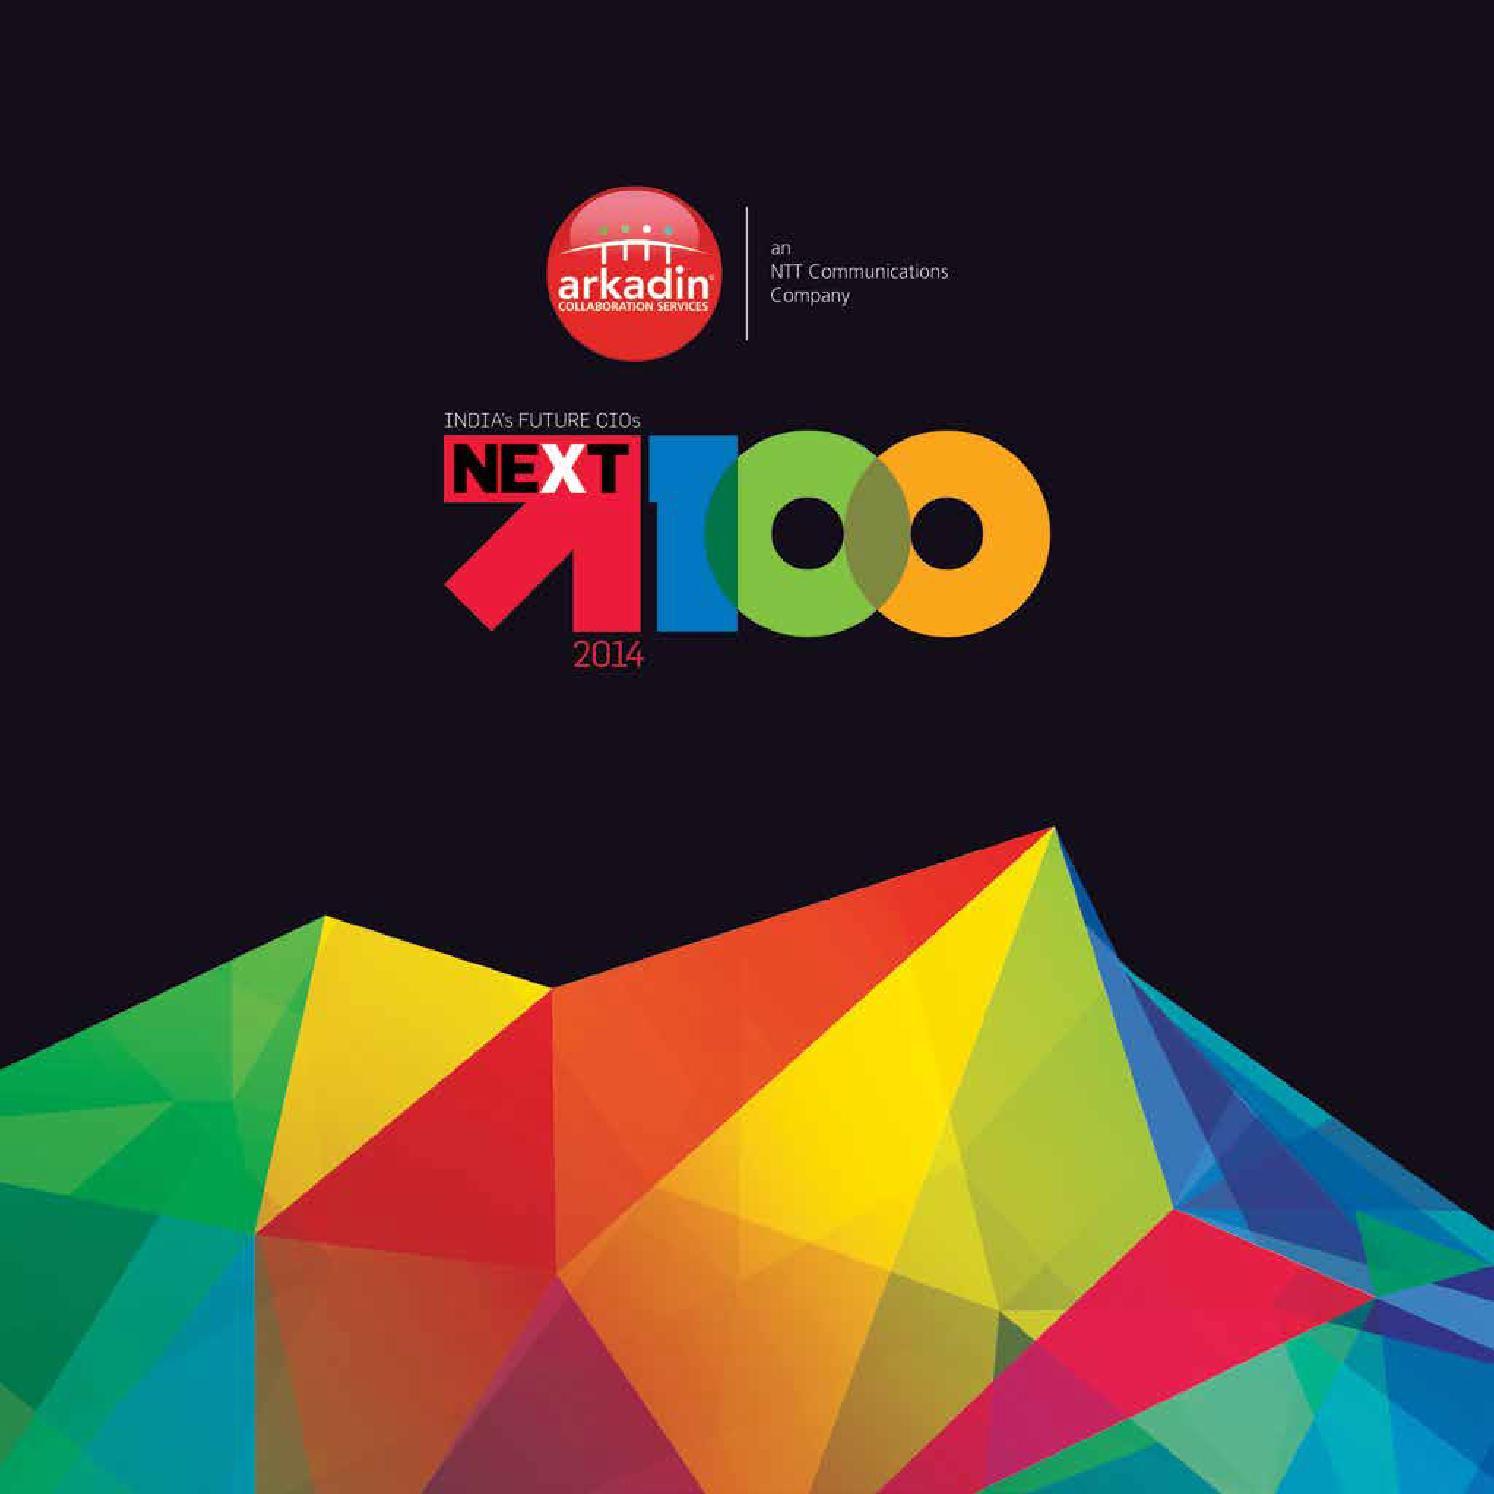 Next100 book 2014 by Manan Mushtaq - issuu